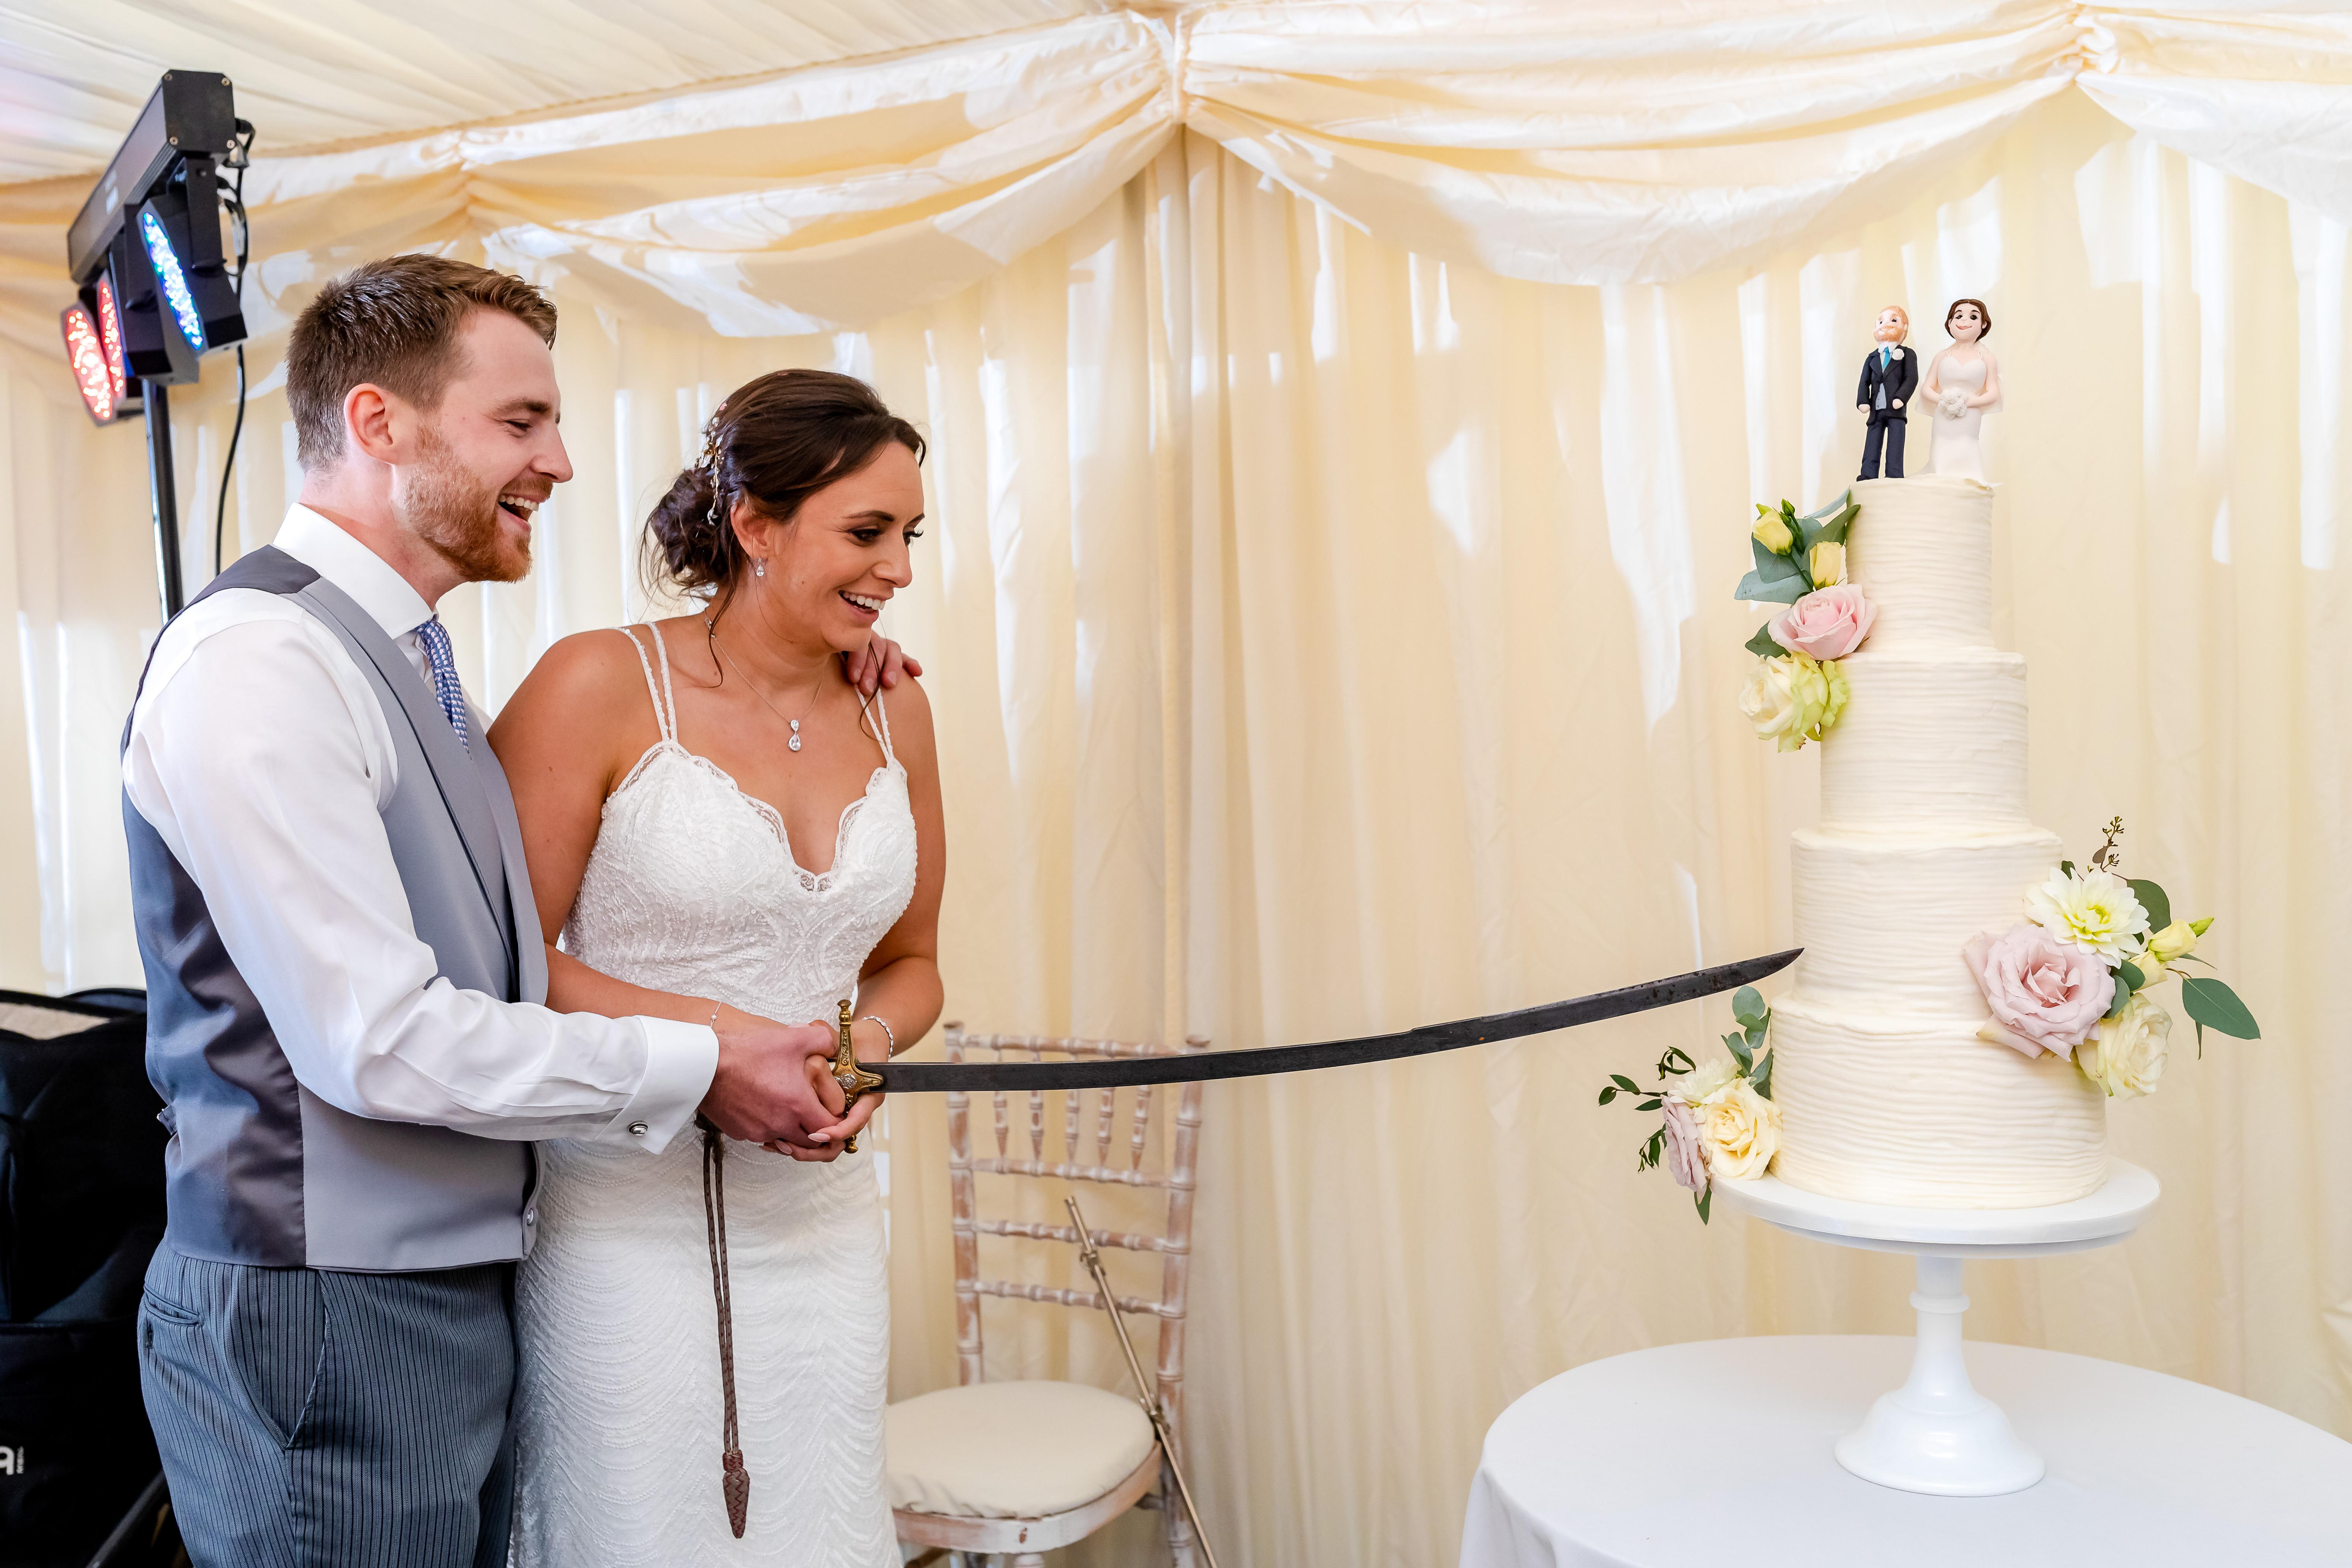 Fonmon castle wedding cutting the cake